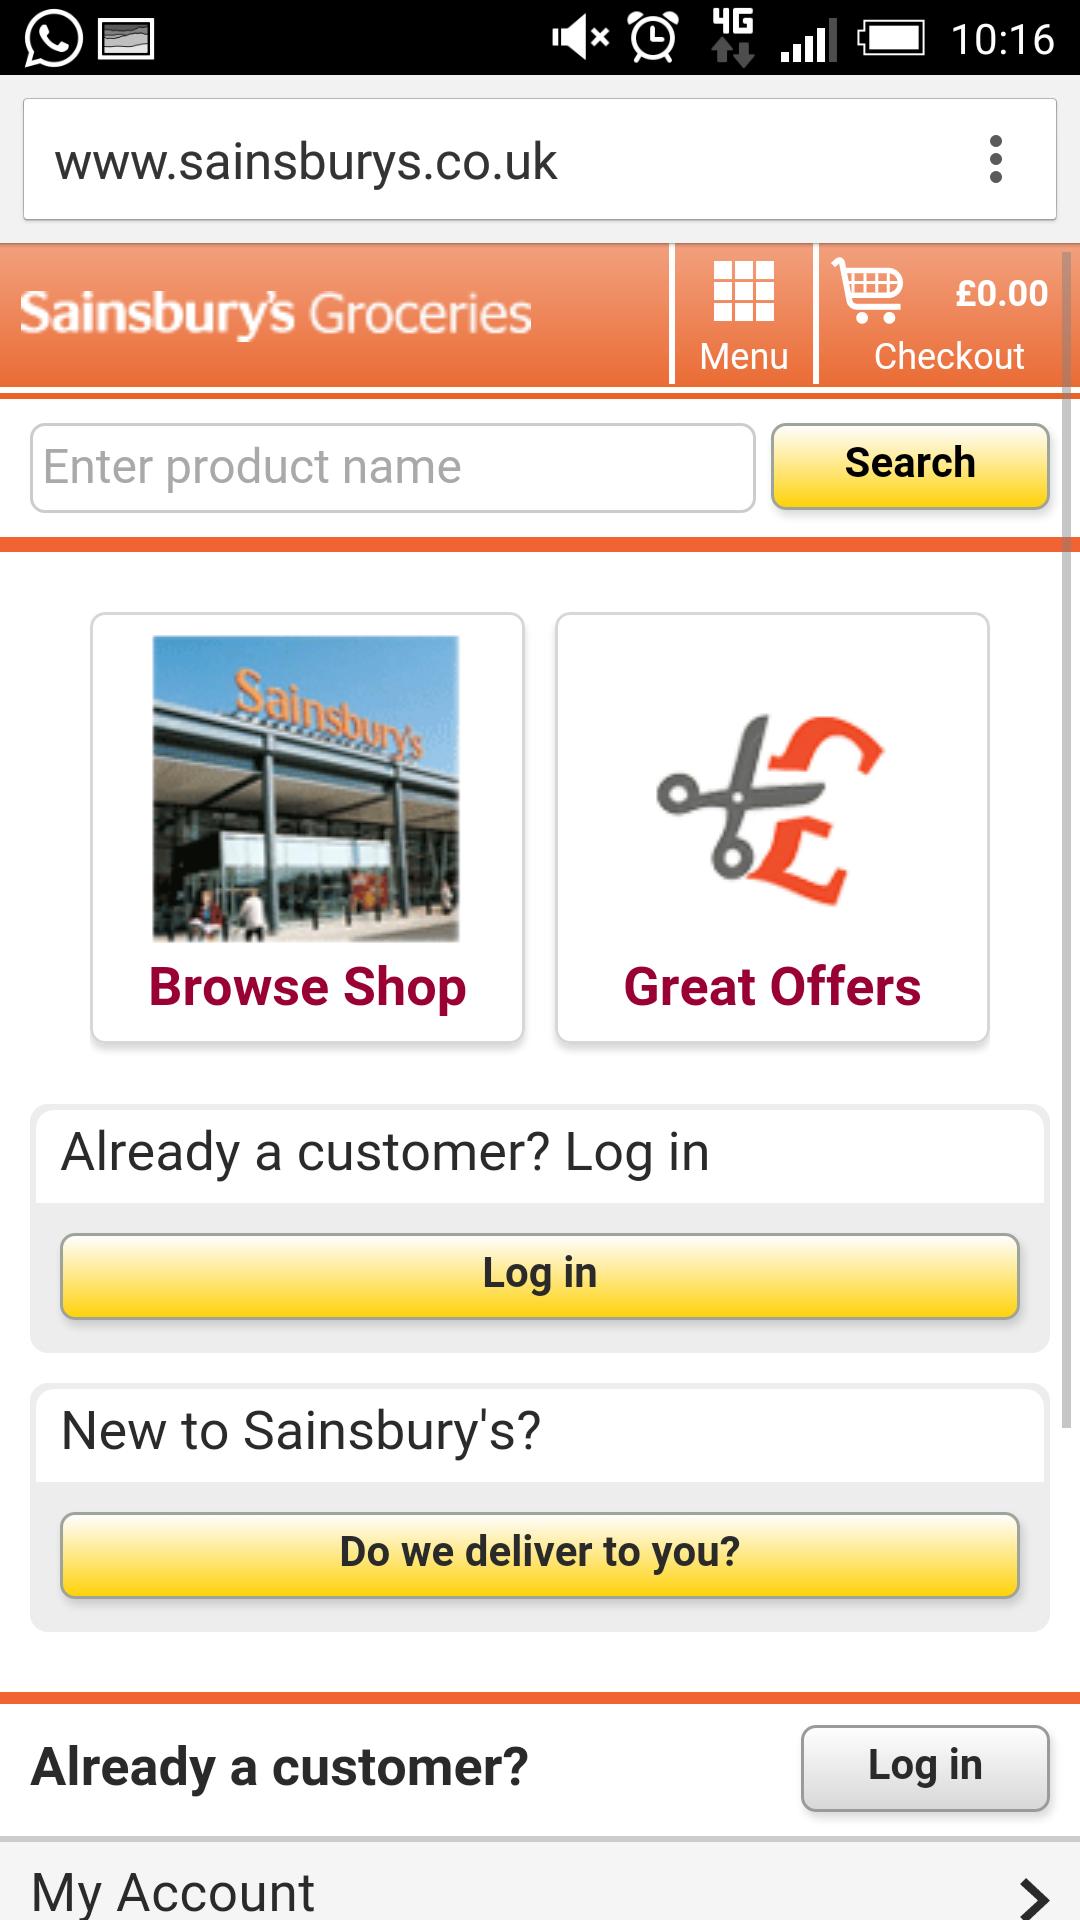 Sainsbury's mobile site